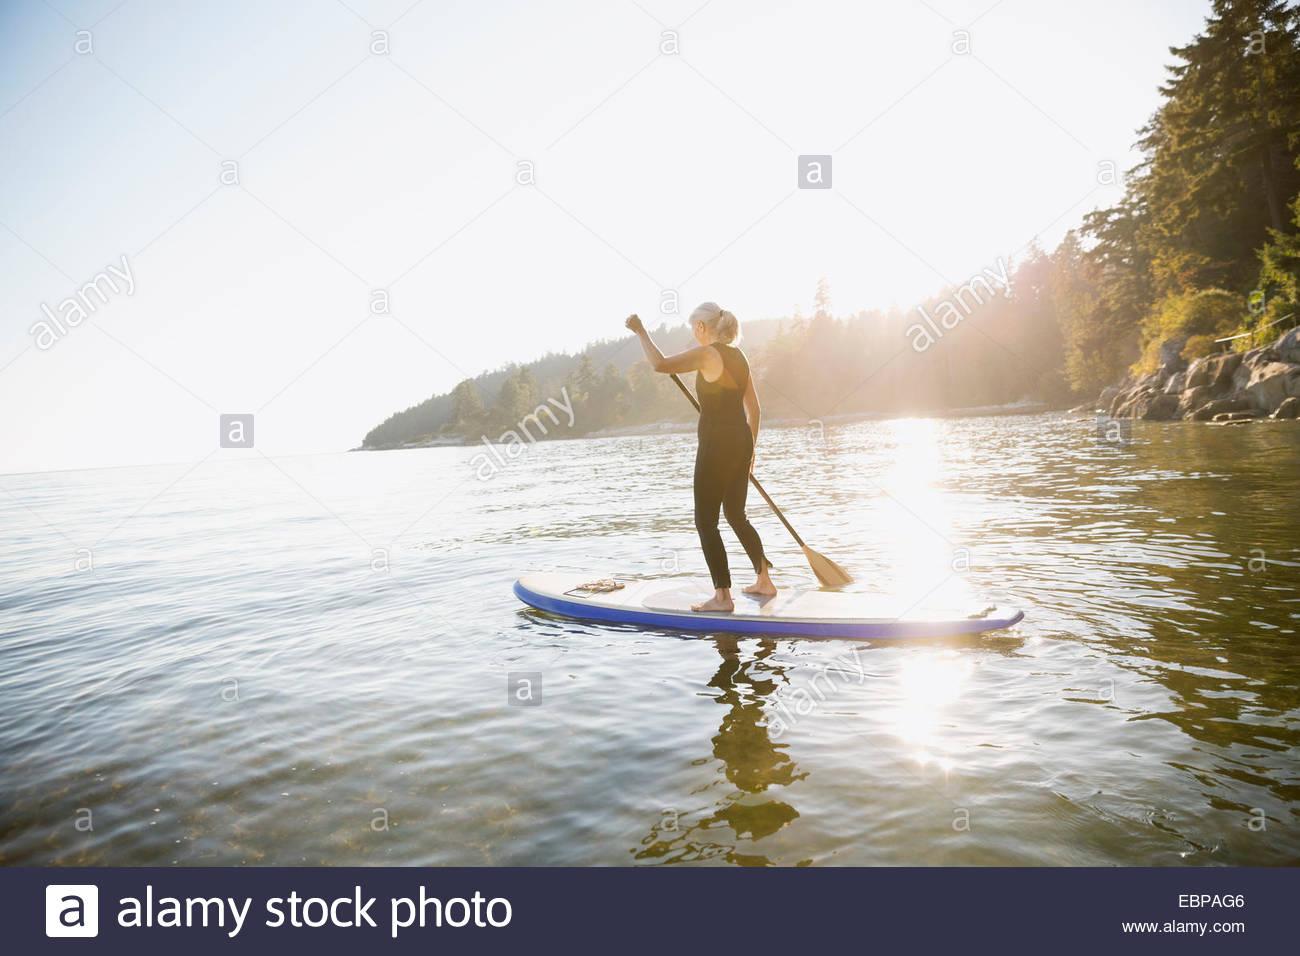 Senior woman paddle boarding in ocean - Stock Image